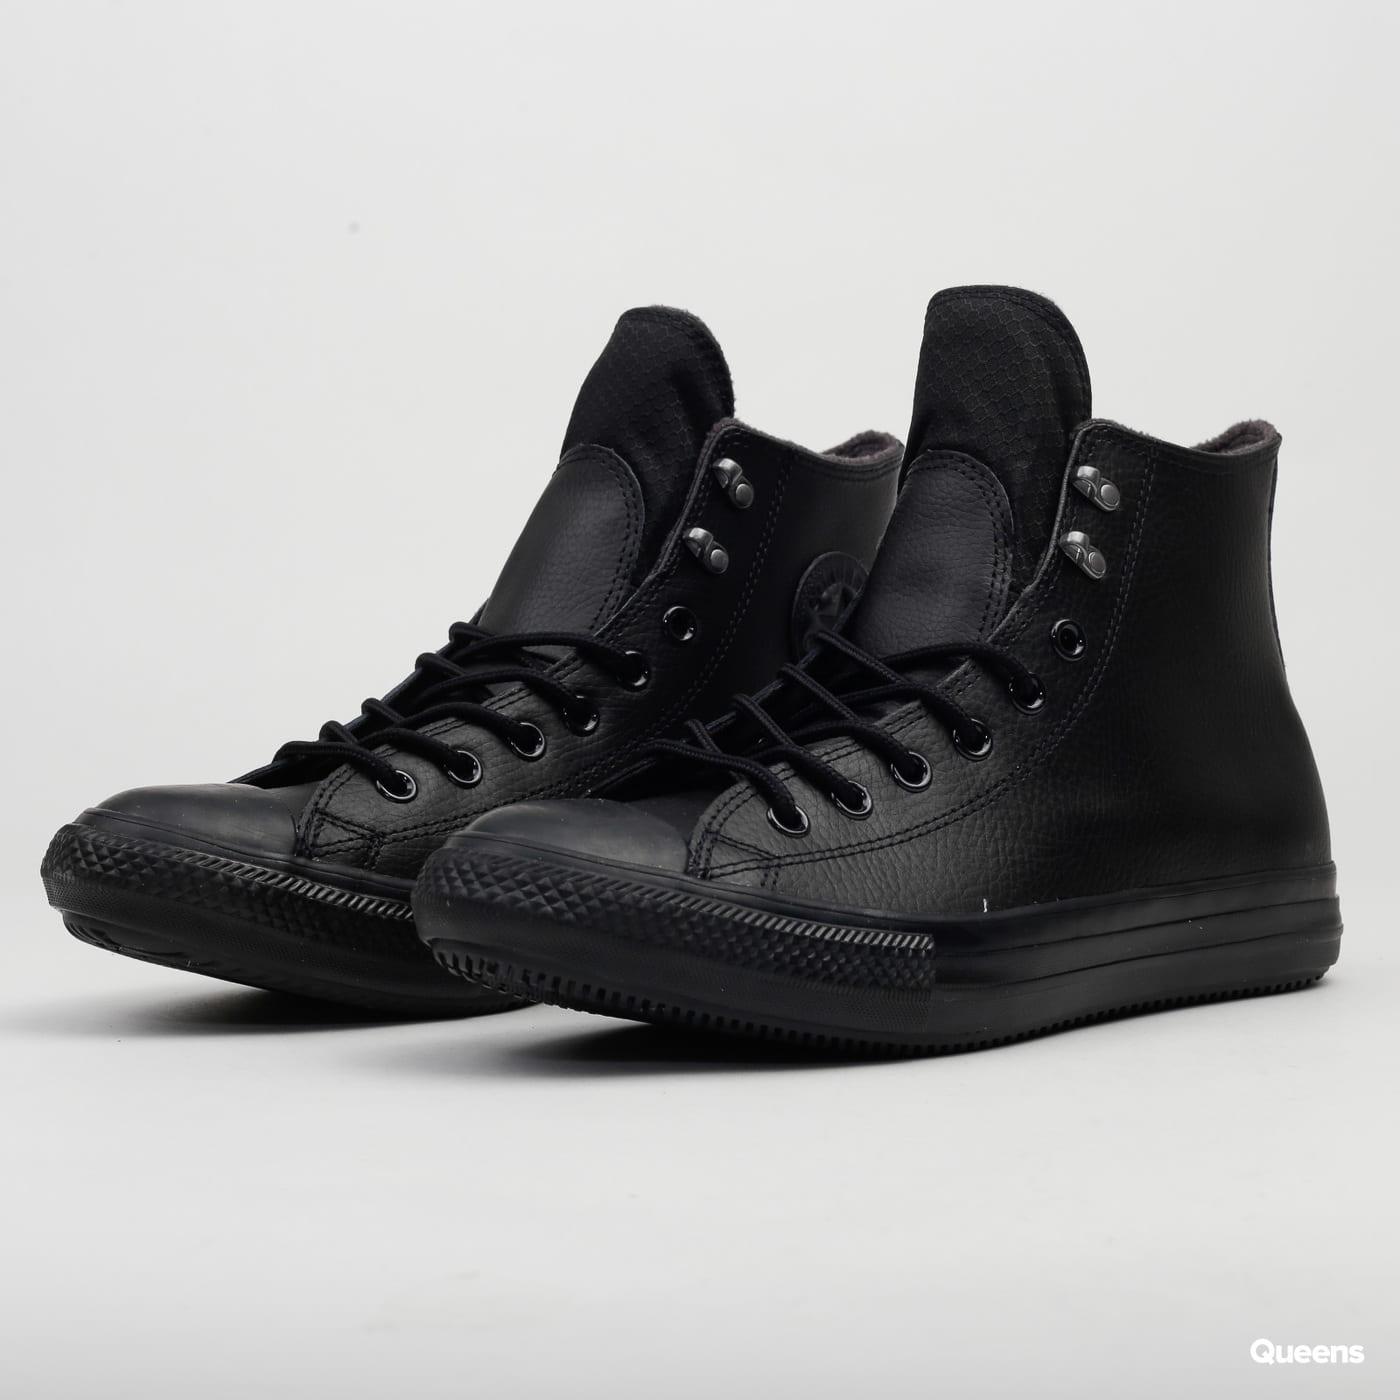 Converse Chuck Taylor AS Winter HI black black black